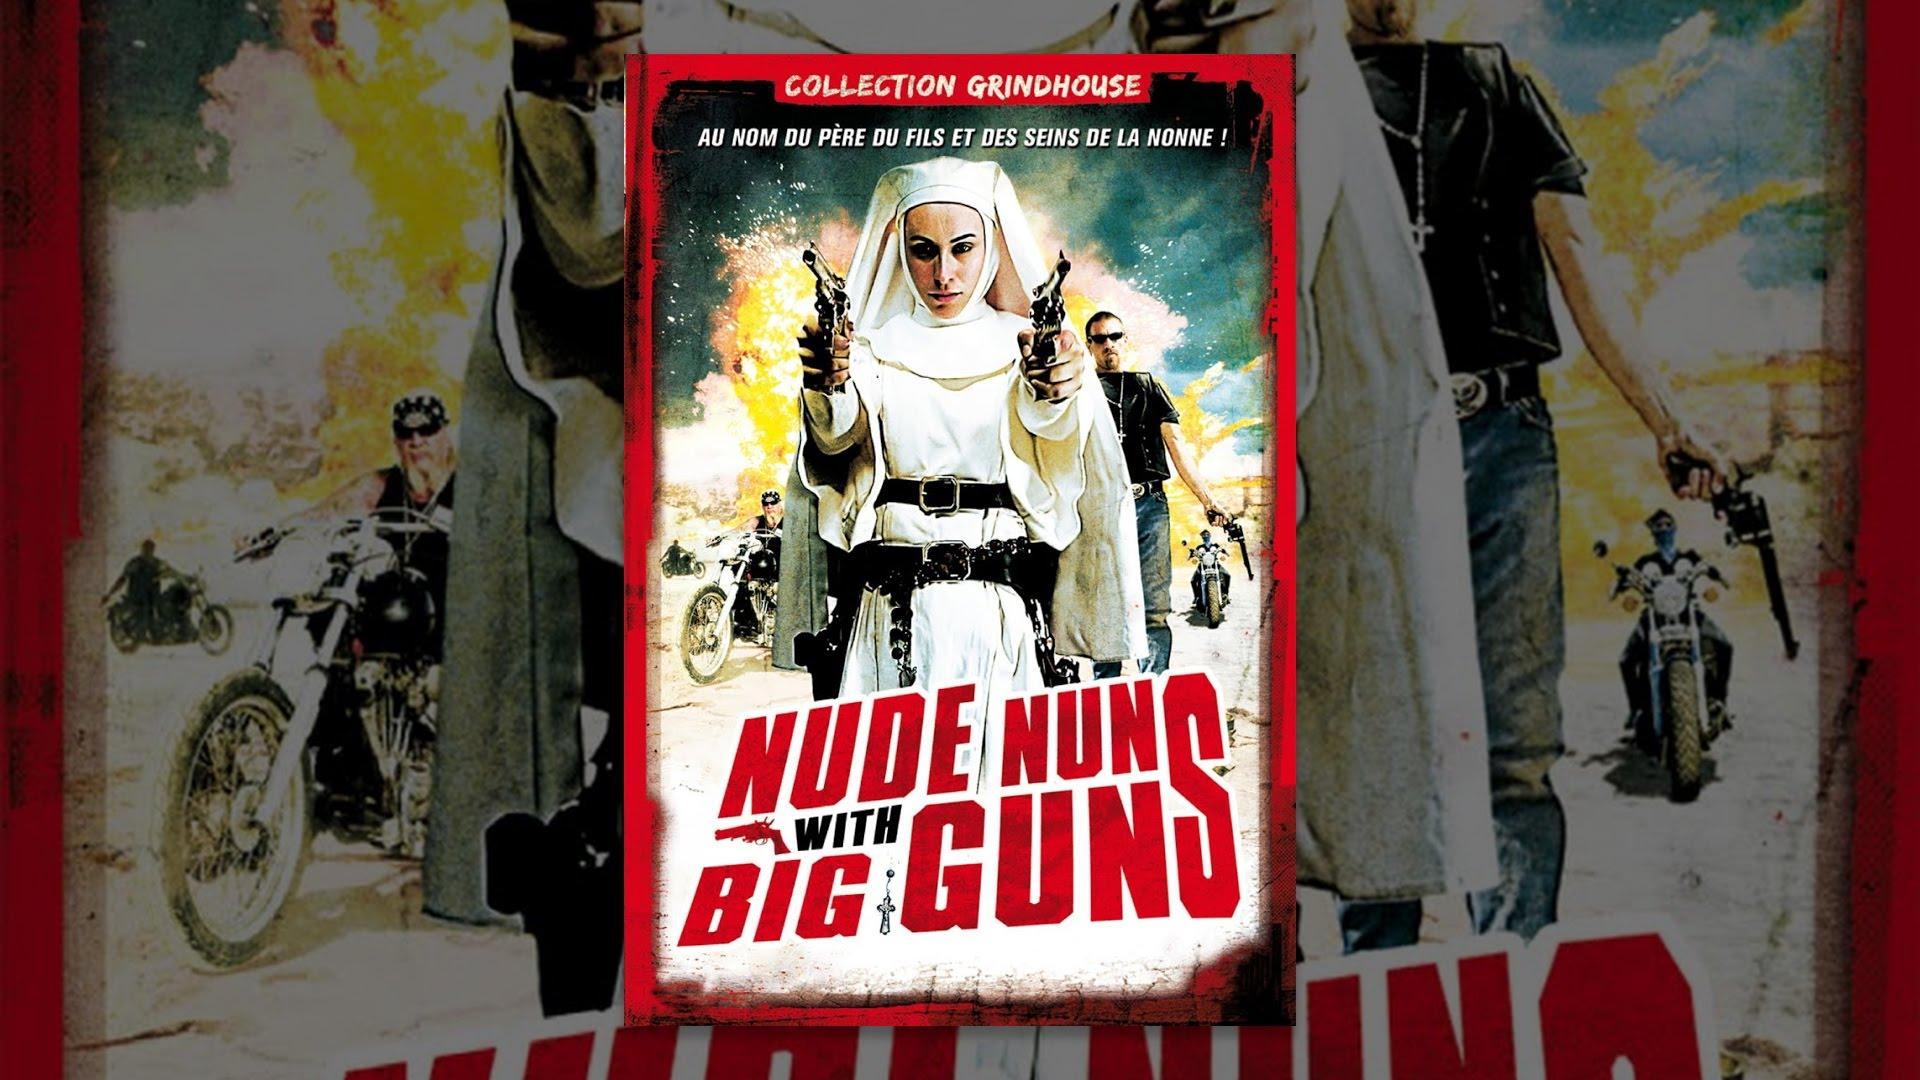 Nude Nuns with Big Guns - YouTube